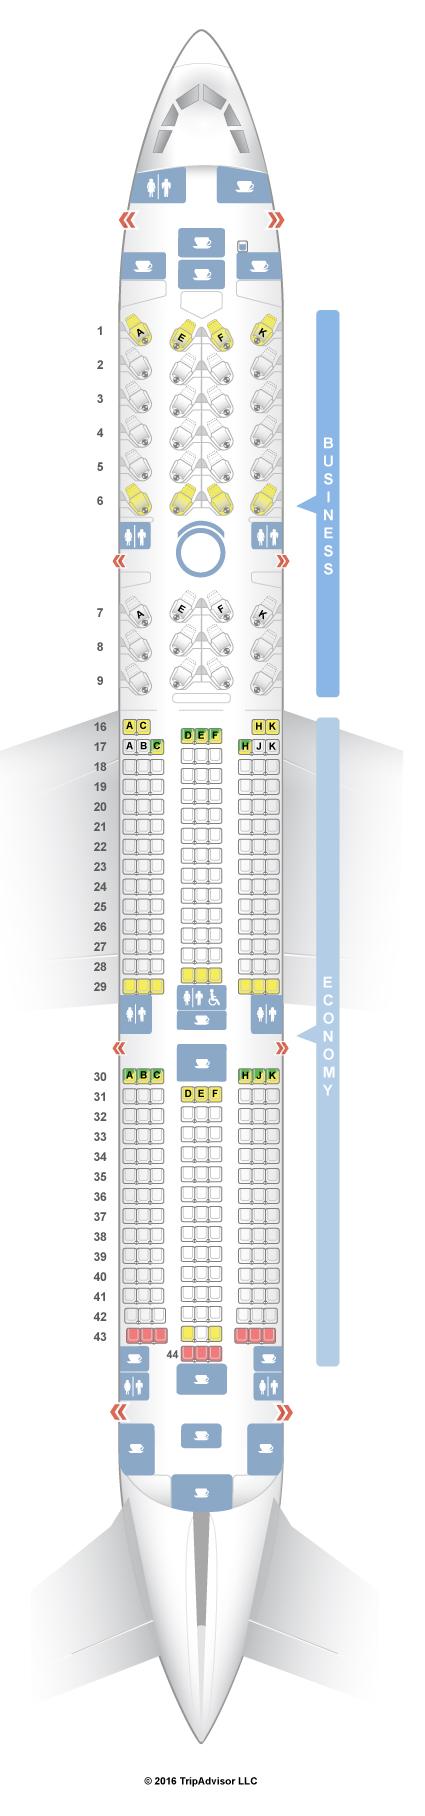 SeatGuru Seat Map Qatar Airways Airbus A350 (350)